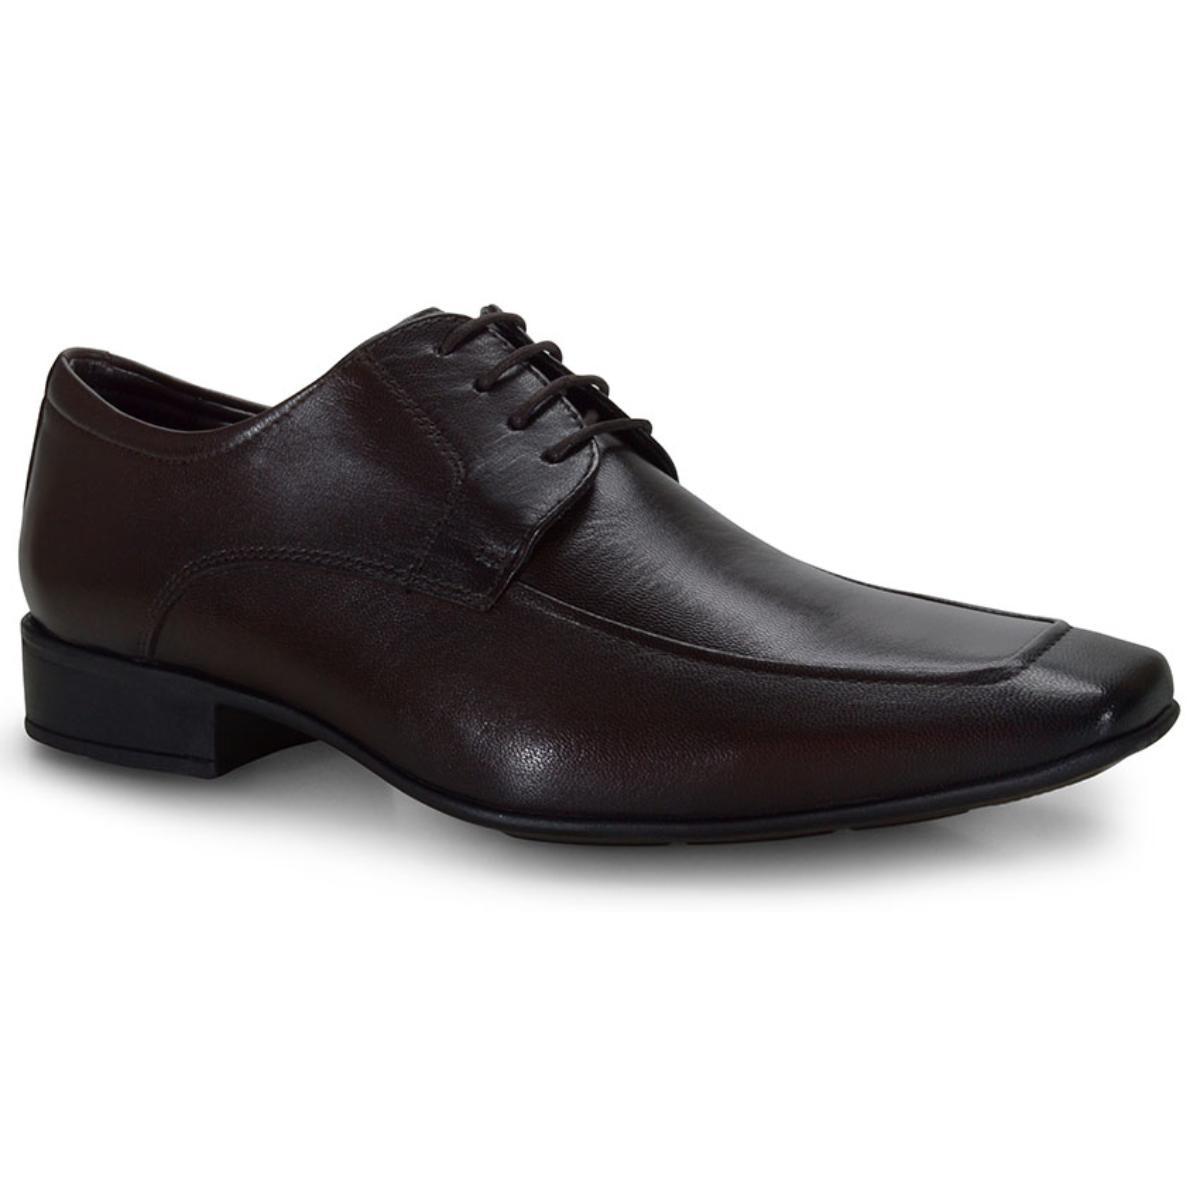 Sapato Masculino Jota pe 40056 Chocolate